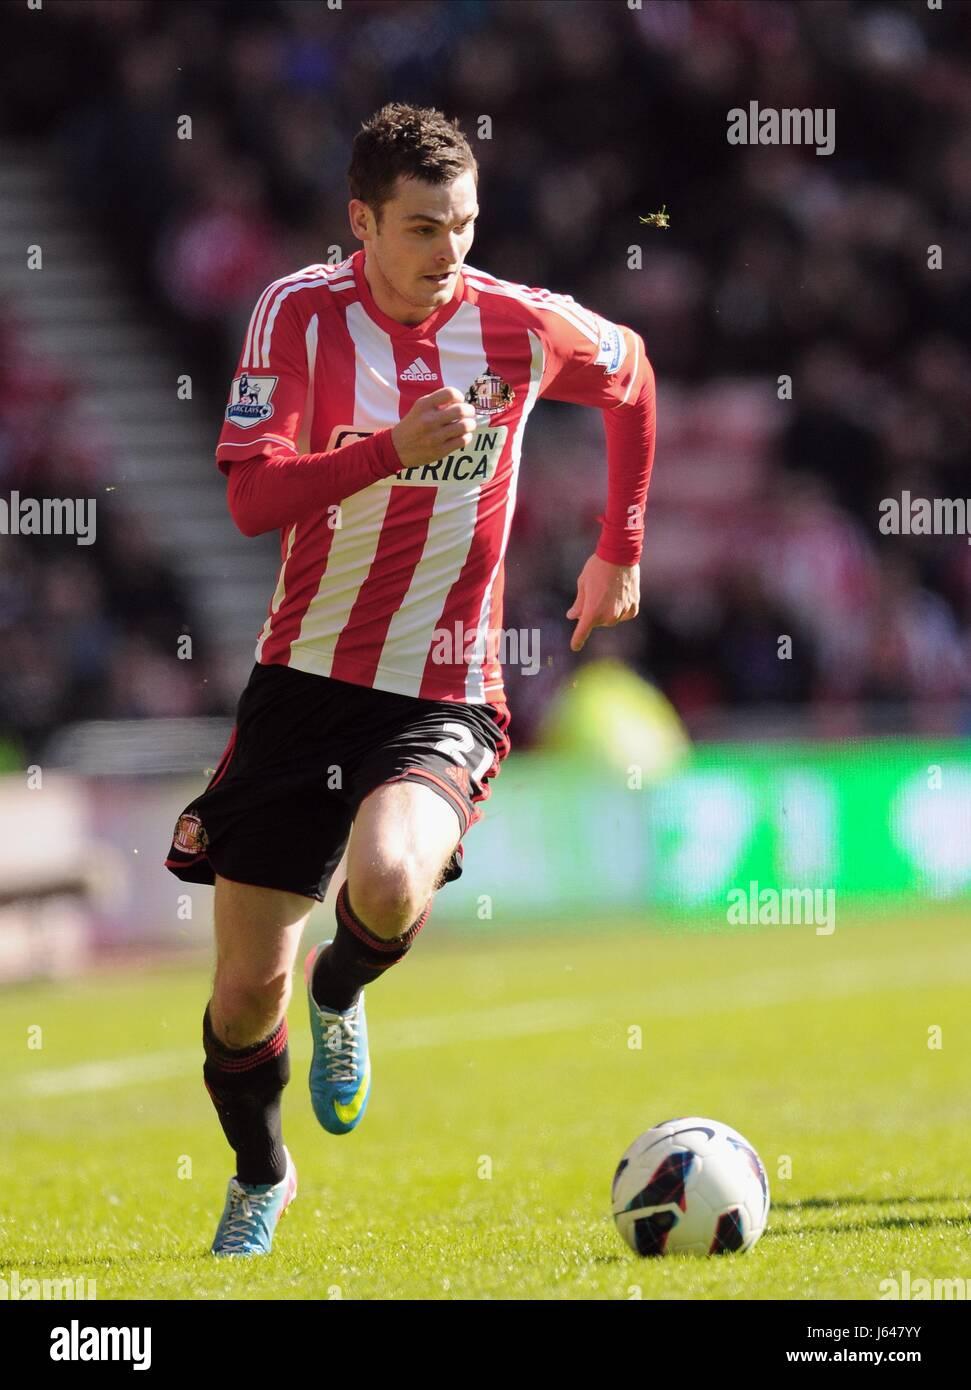 ADAM JOHNSON SUNDERLAND FC STADIUM OF LIGHT SUNDERLAND ENGLAND 30 March 2013 - Stock Image